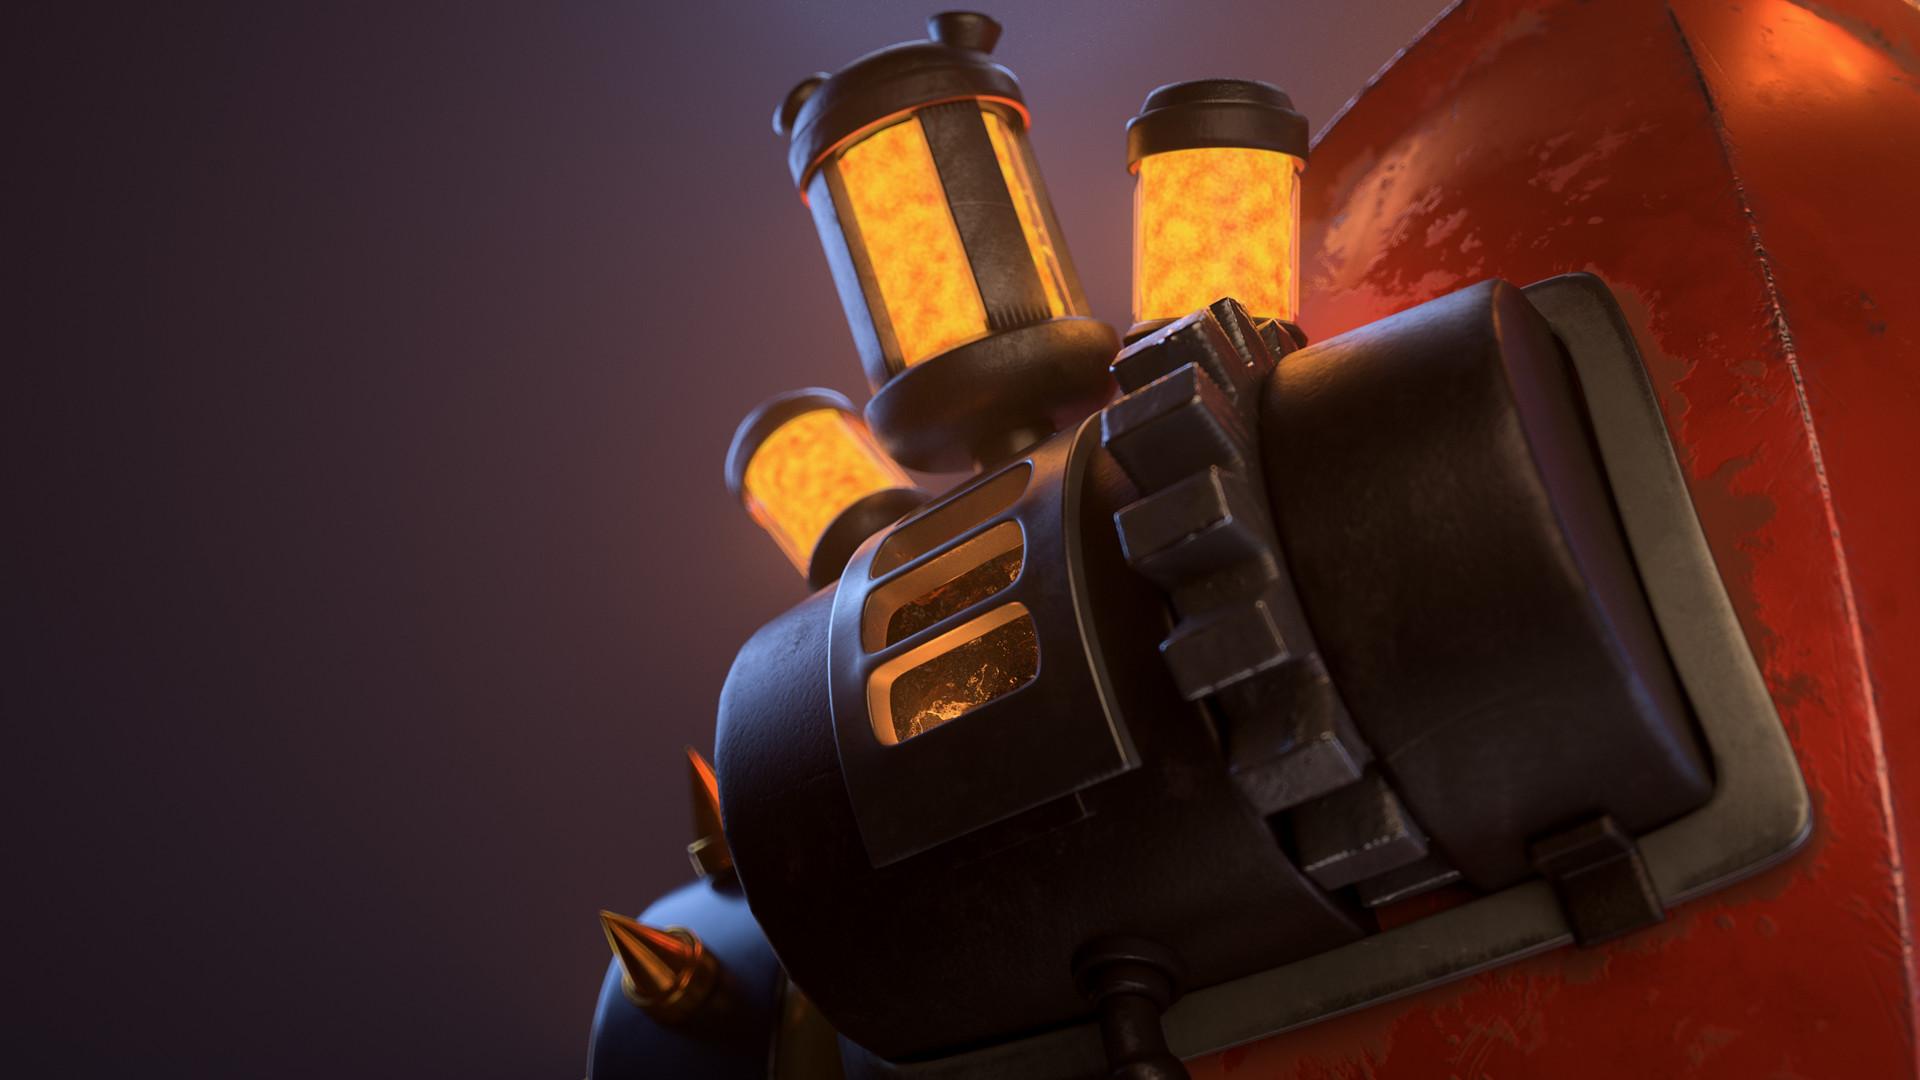 Dawid cencora engine